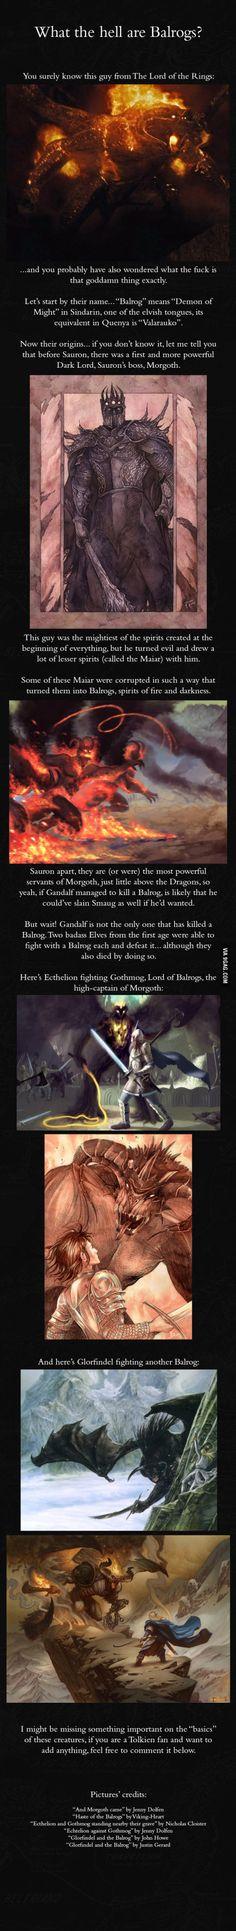 The Balrogs - J.R.R. Tolkien's mythology